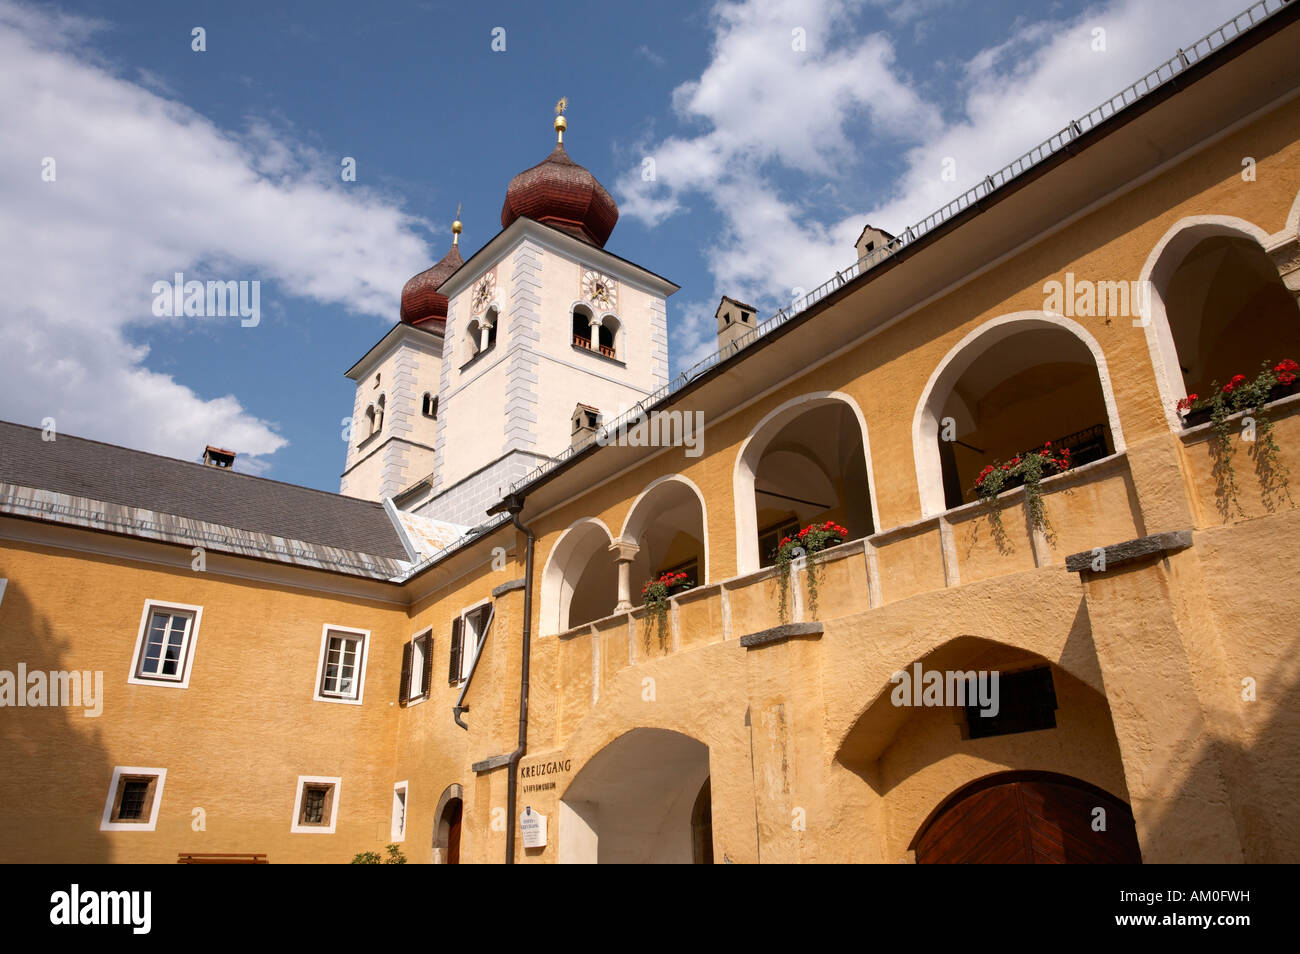 Former monastery Stift Millstatt with steeples of the parish church, Carinthia, Austria - Stock Image